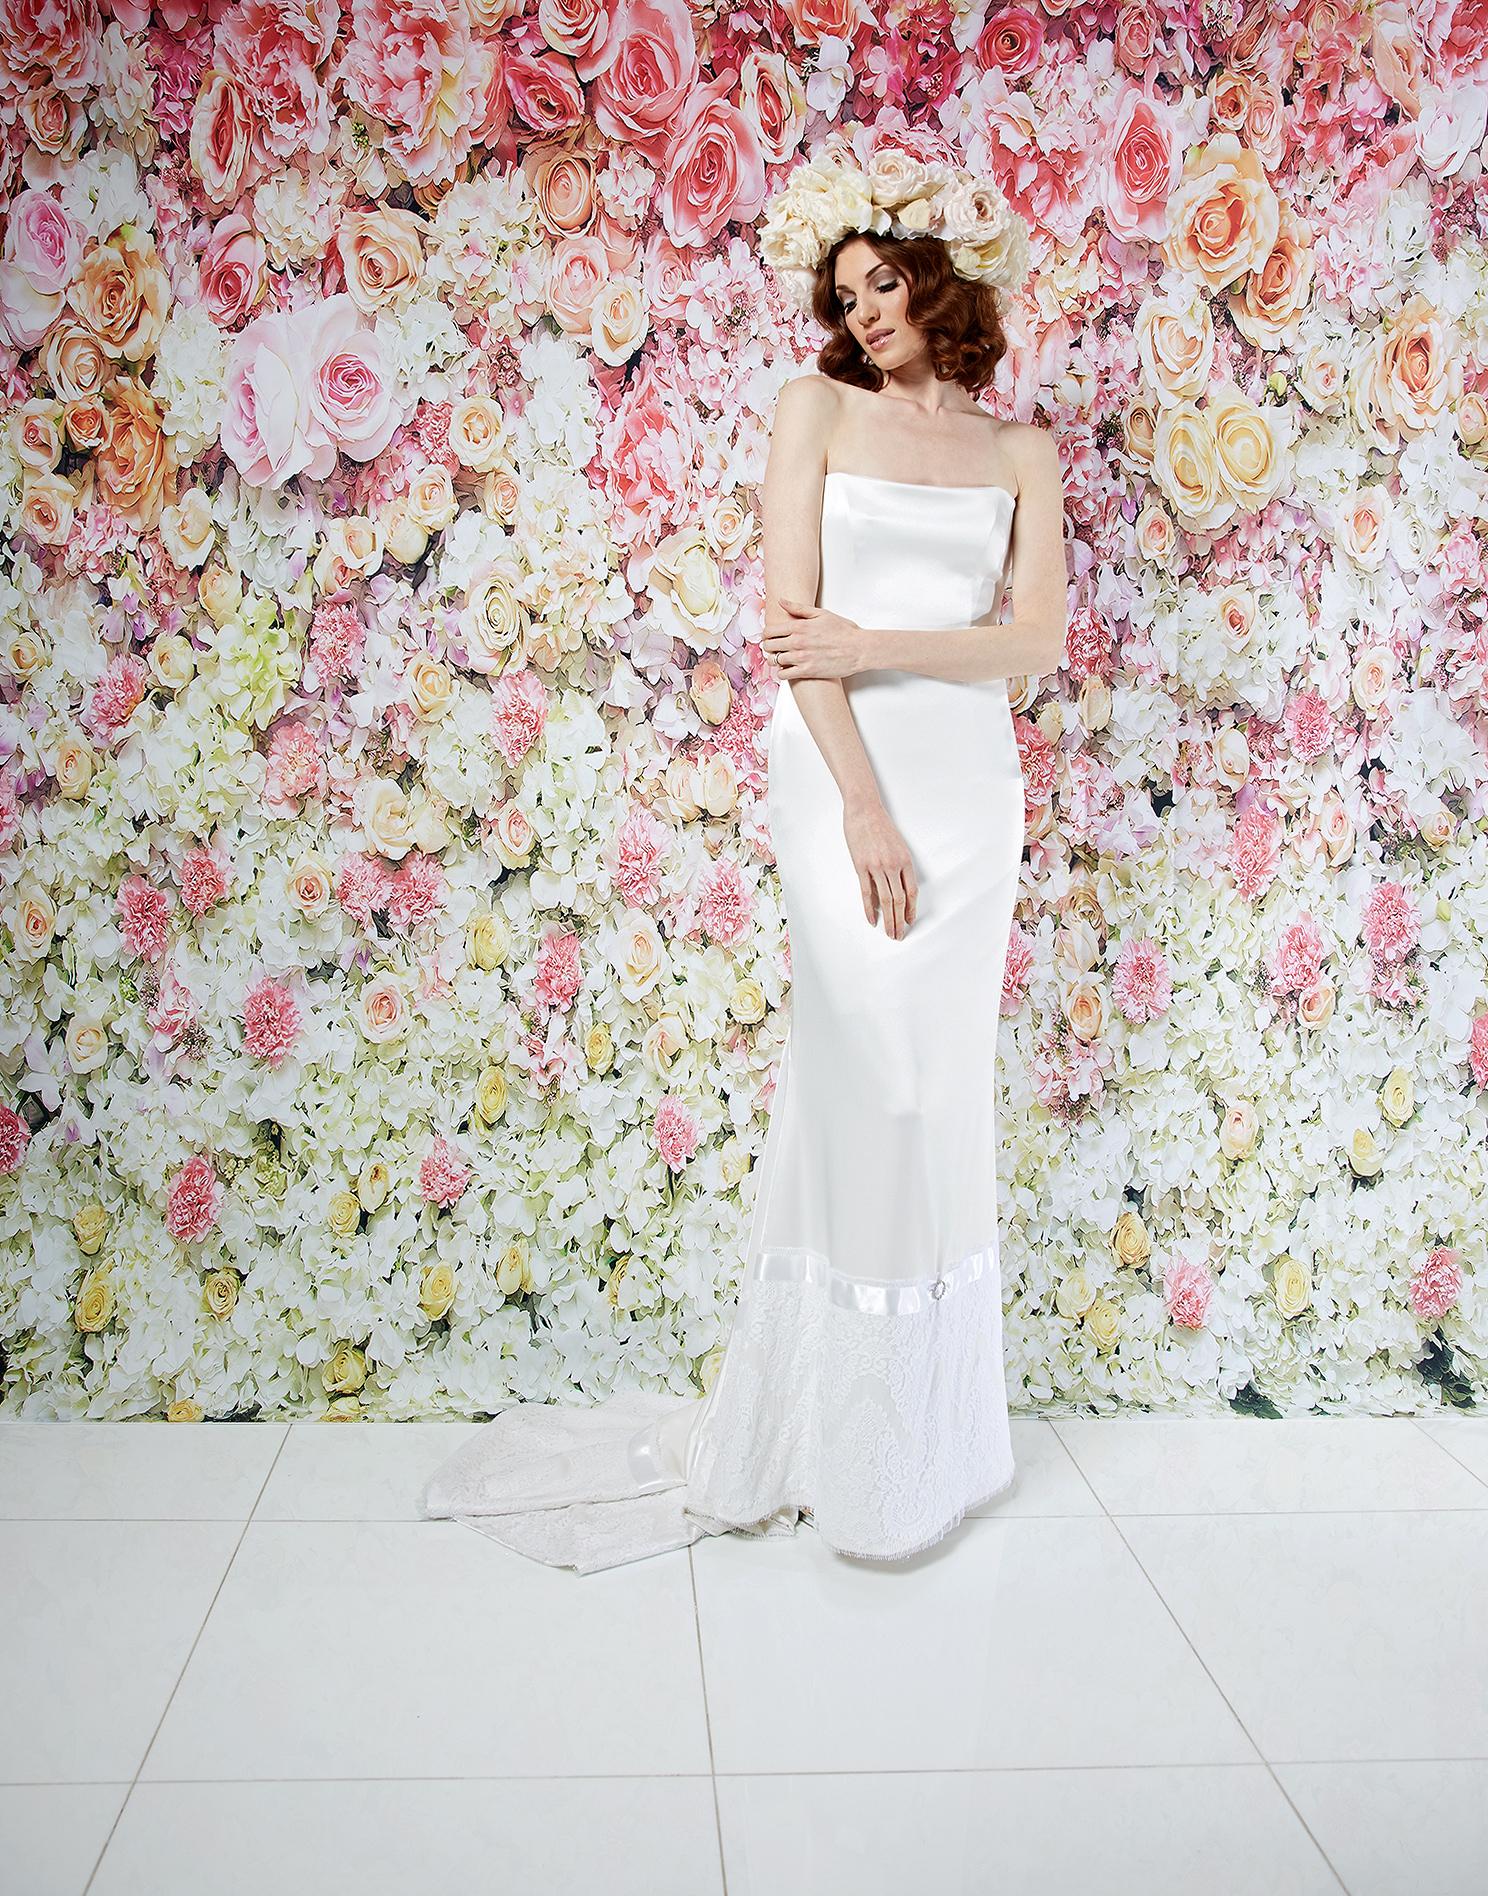 randi rahm wedding dress spring 2019 strapless sheath skirt details